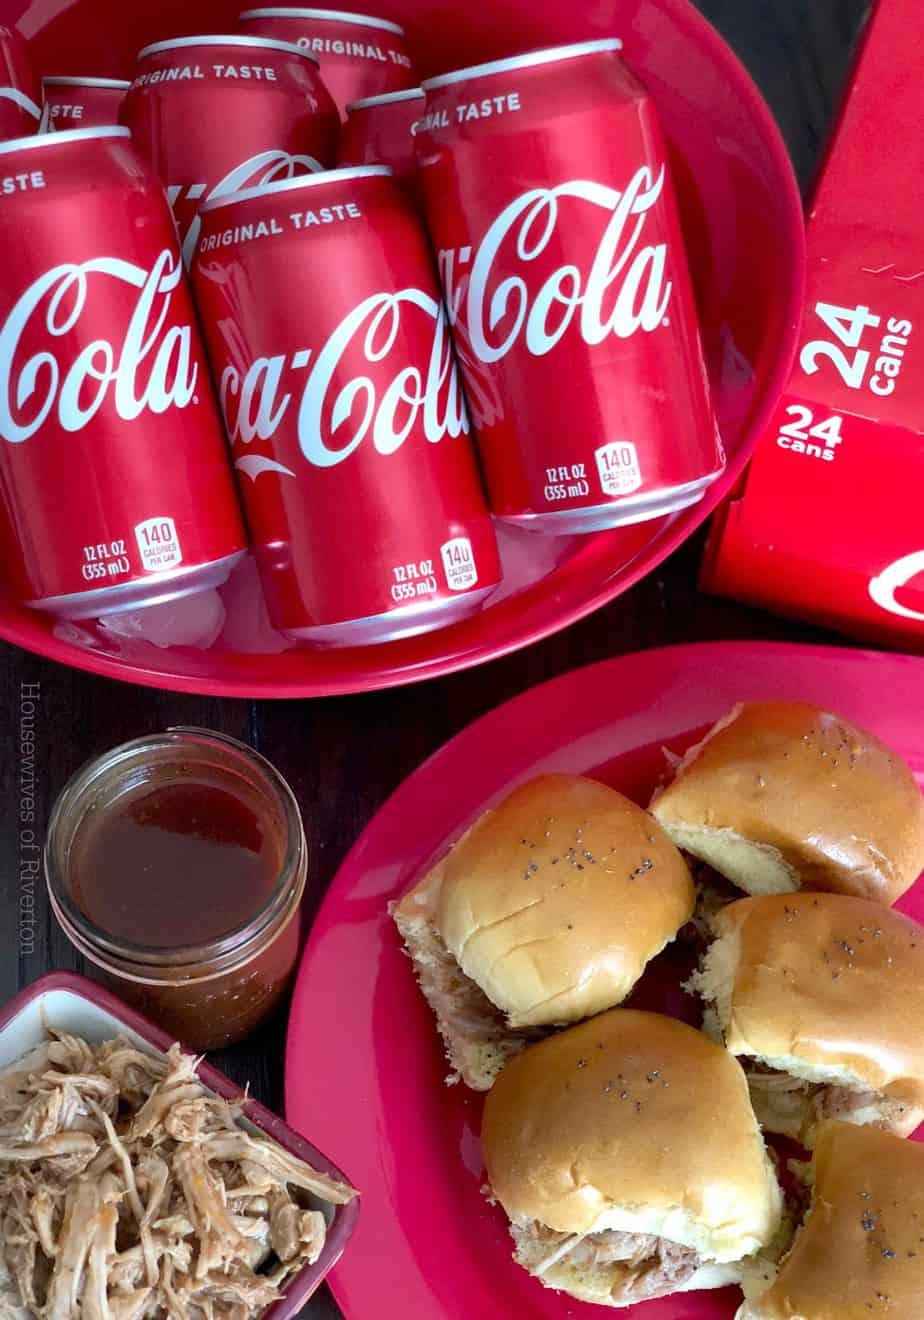 Coca Cola Pulled Pork Sliders with Hawaiian Sweet Rolls | www.housewivesofriverton.com